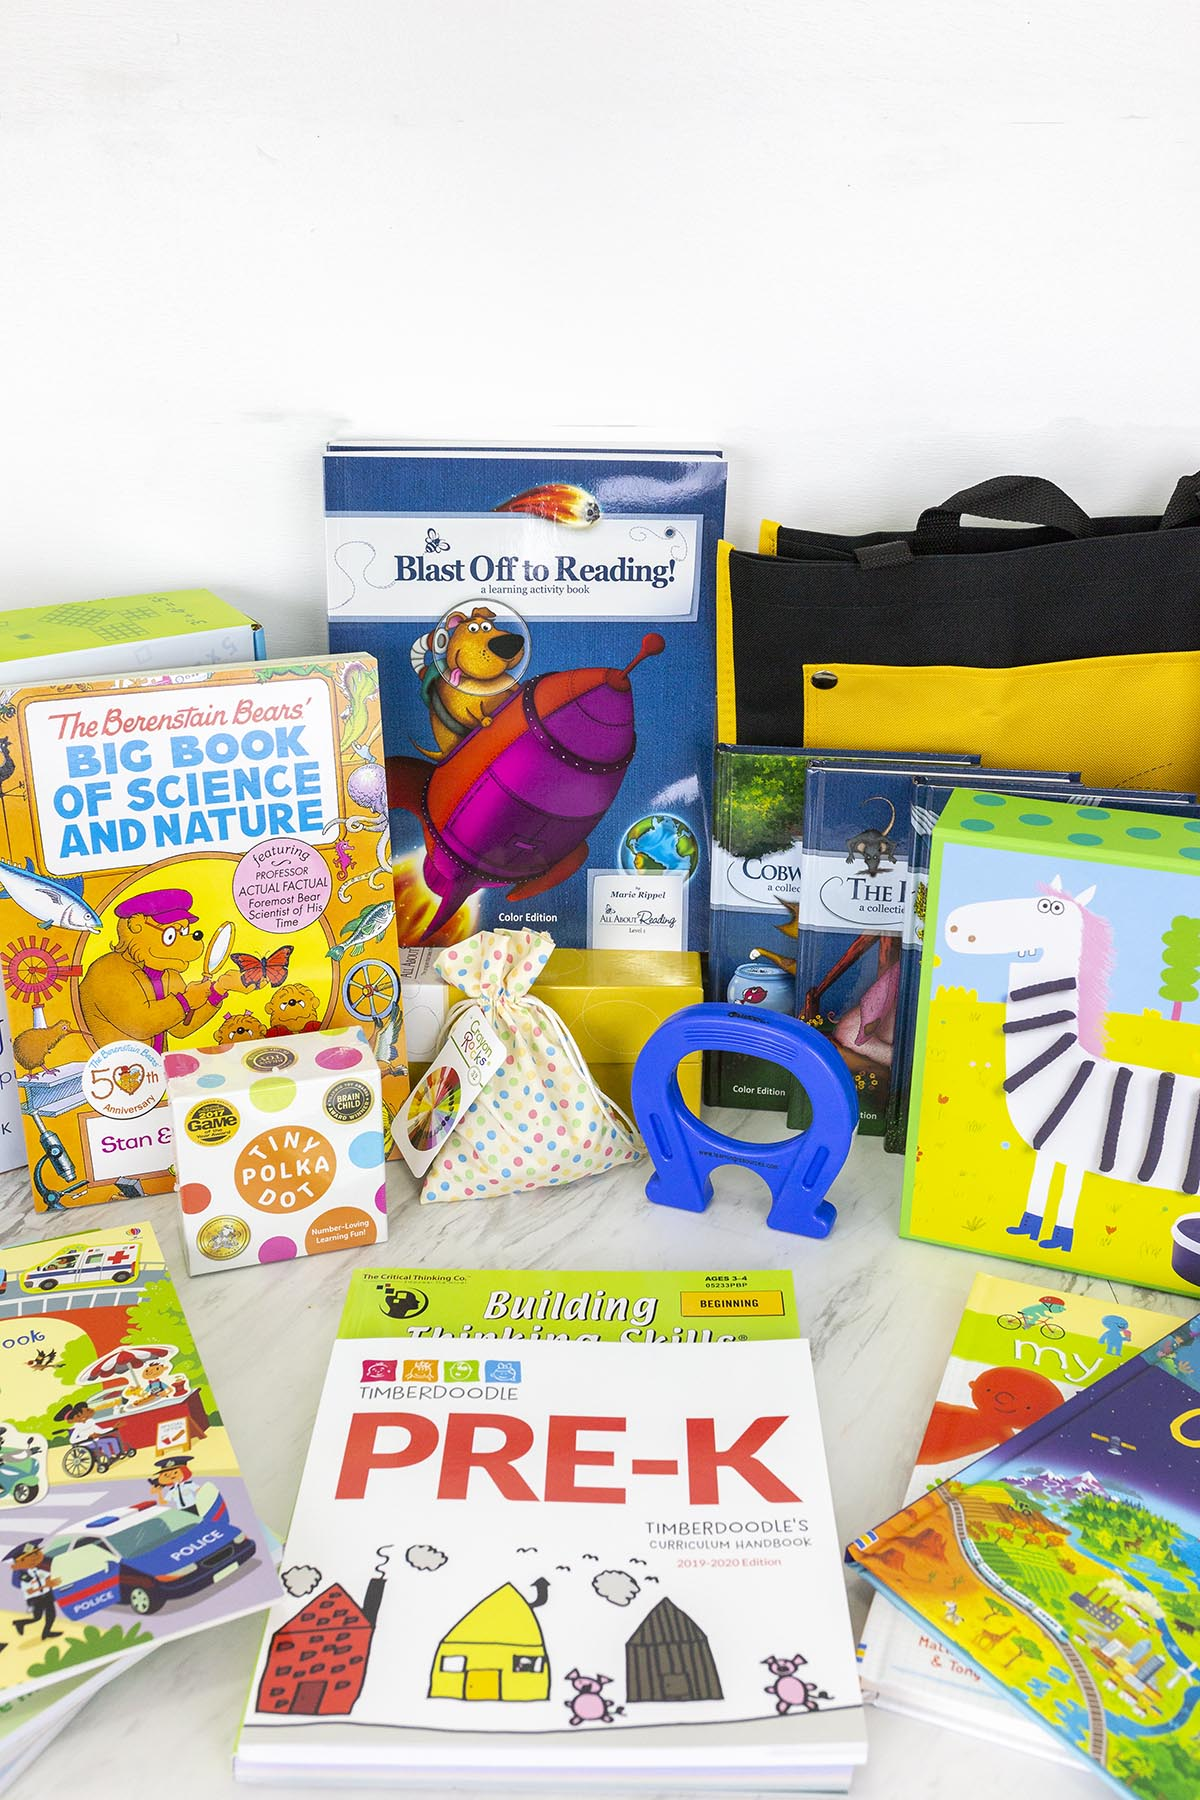 Timberdoodle Preschool Curriculum Kit Review